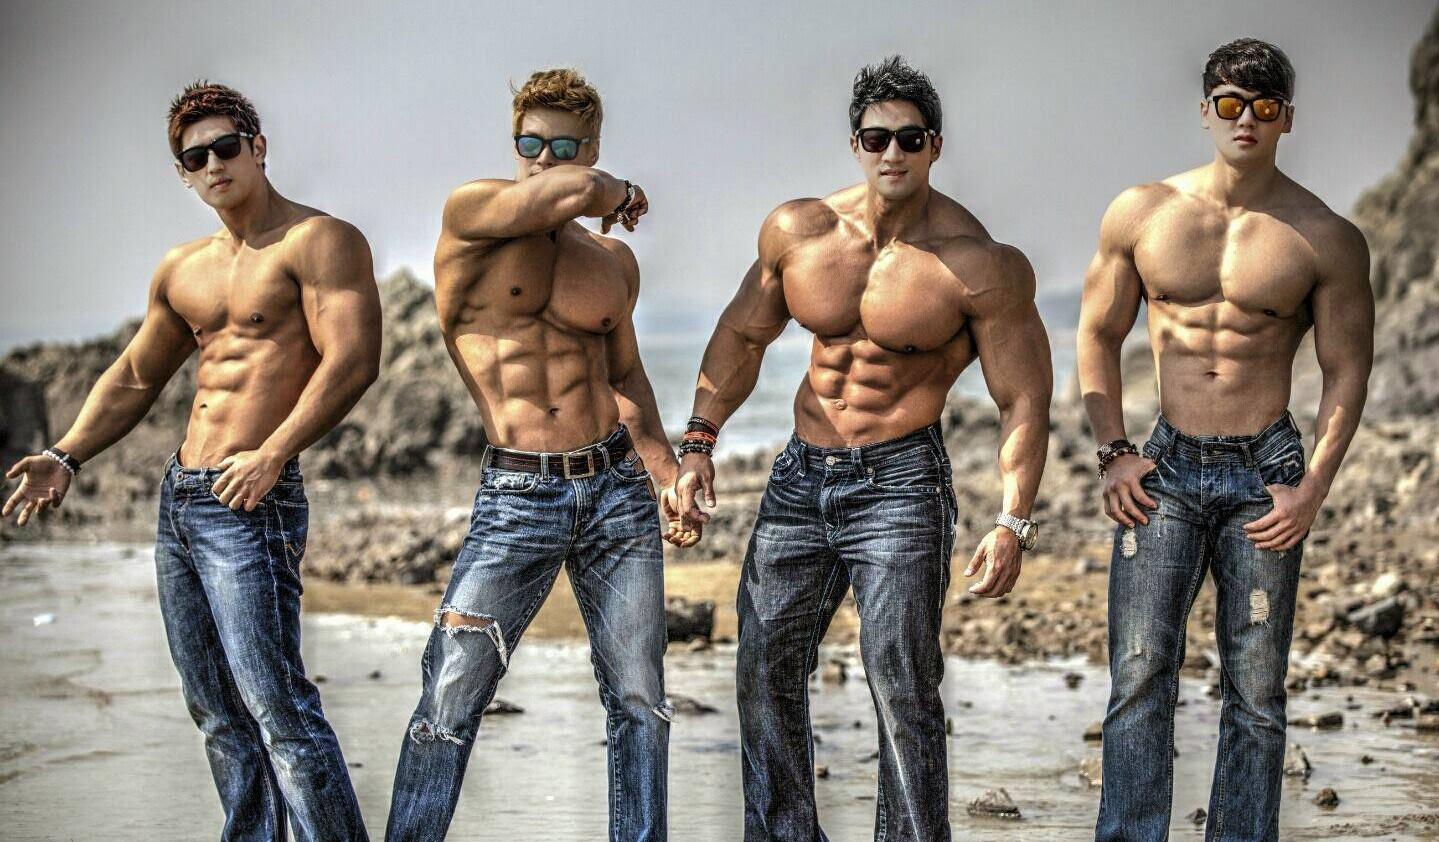 13 Mega-Swole Korean Hulk Juggernaut Bodybuilders